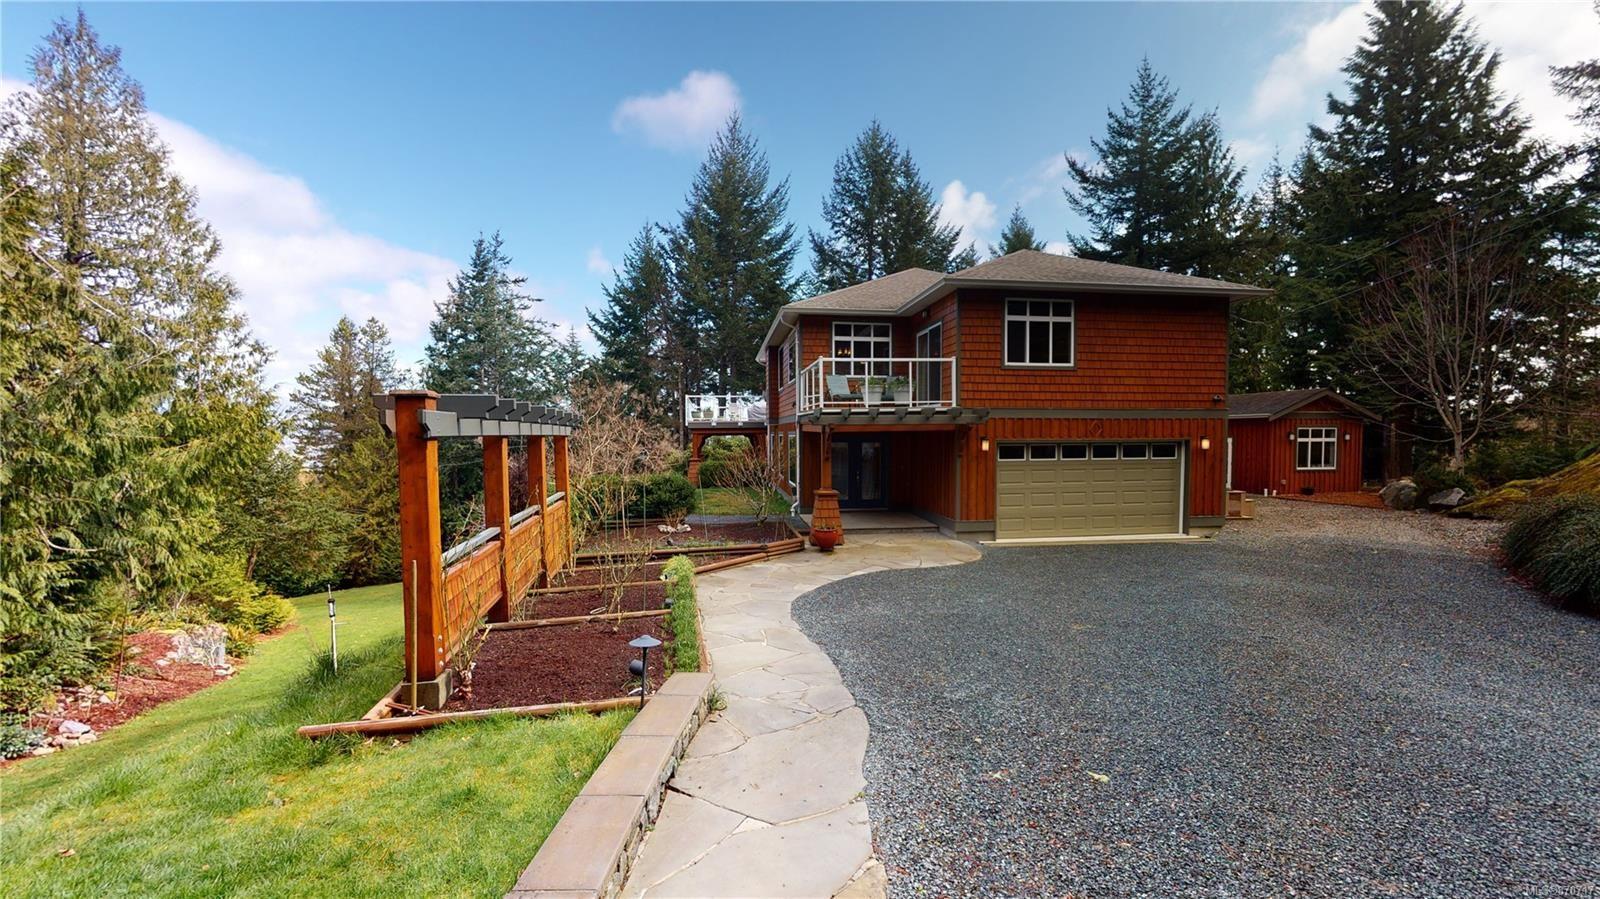 Main Photo: 6098 Copper View Lane in : Sk East Sooke House for sale (Sooke)  : MLS®# 870717